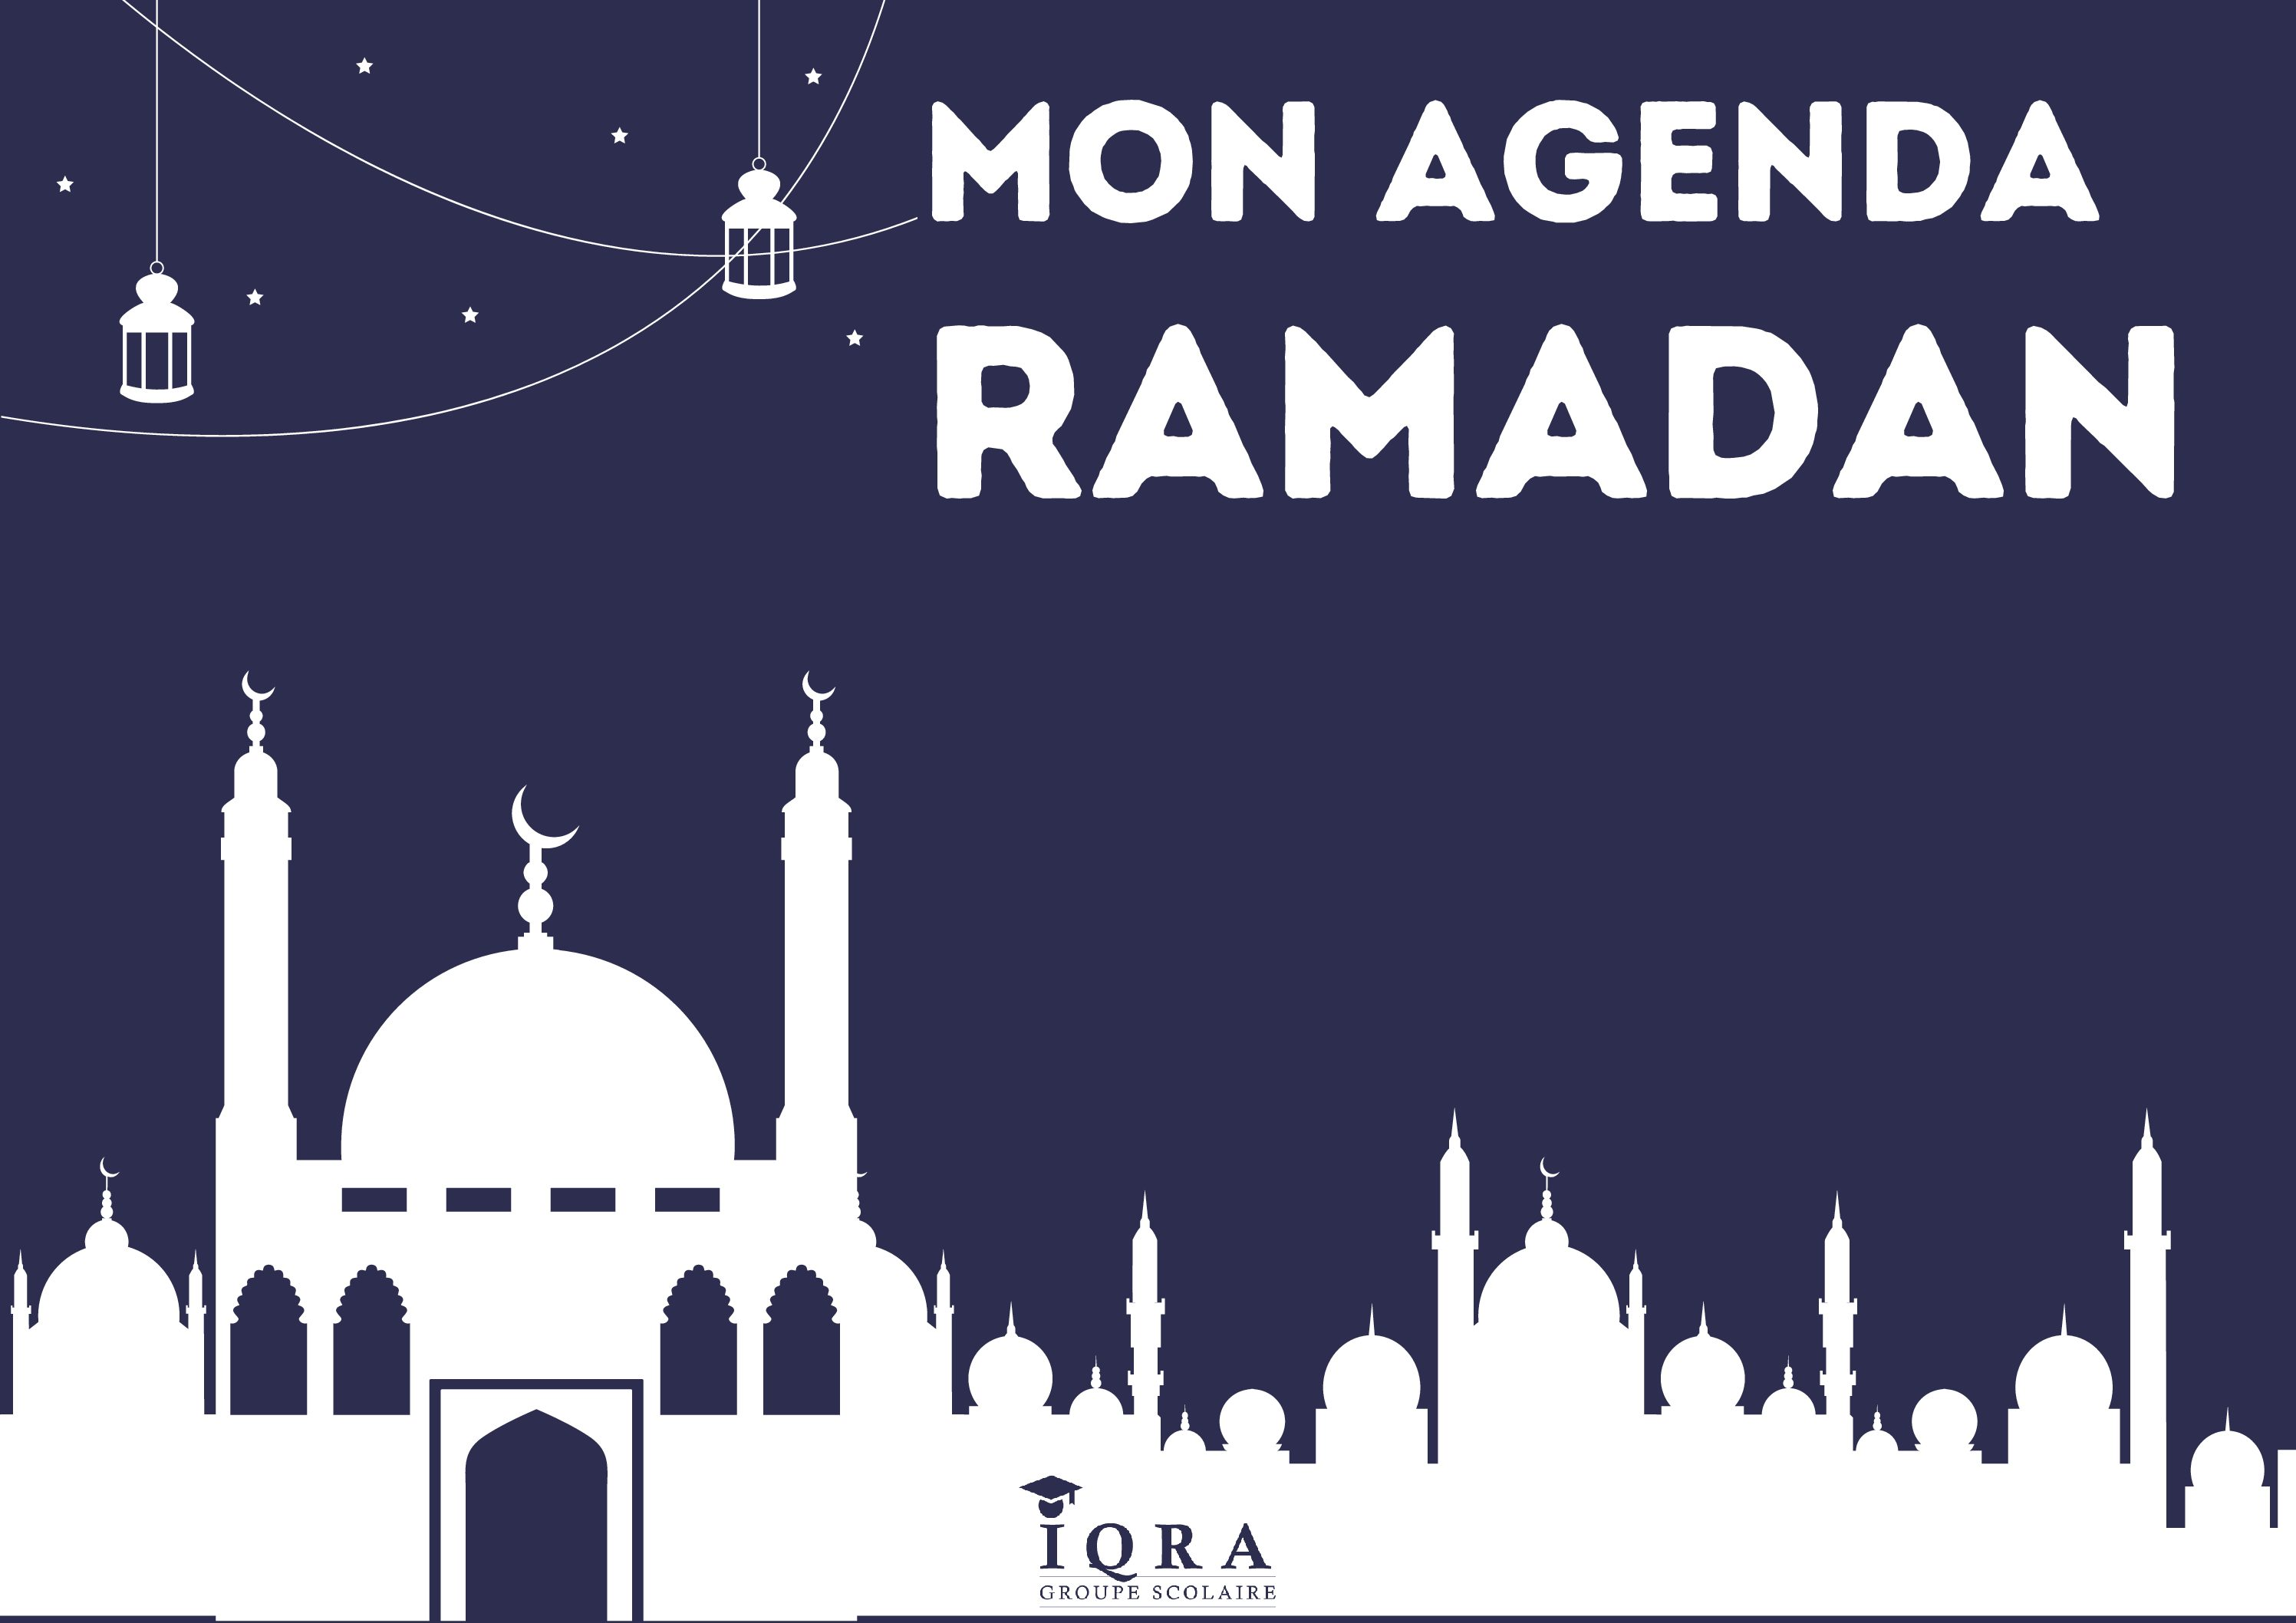 Agenda ramadan collégien